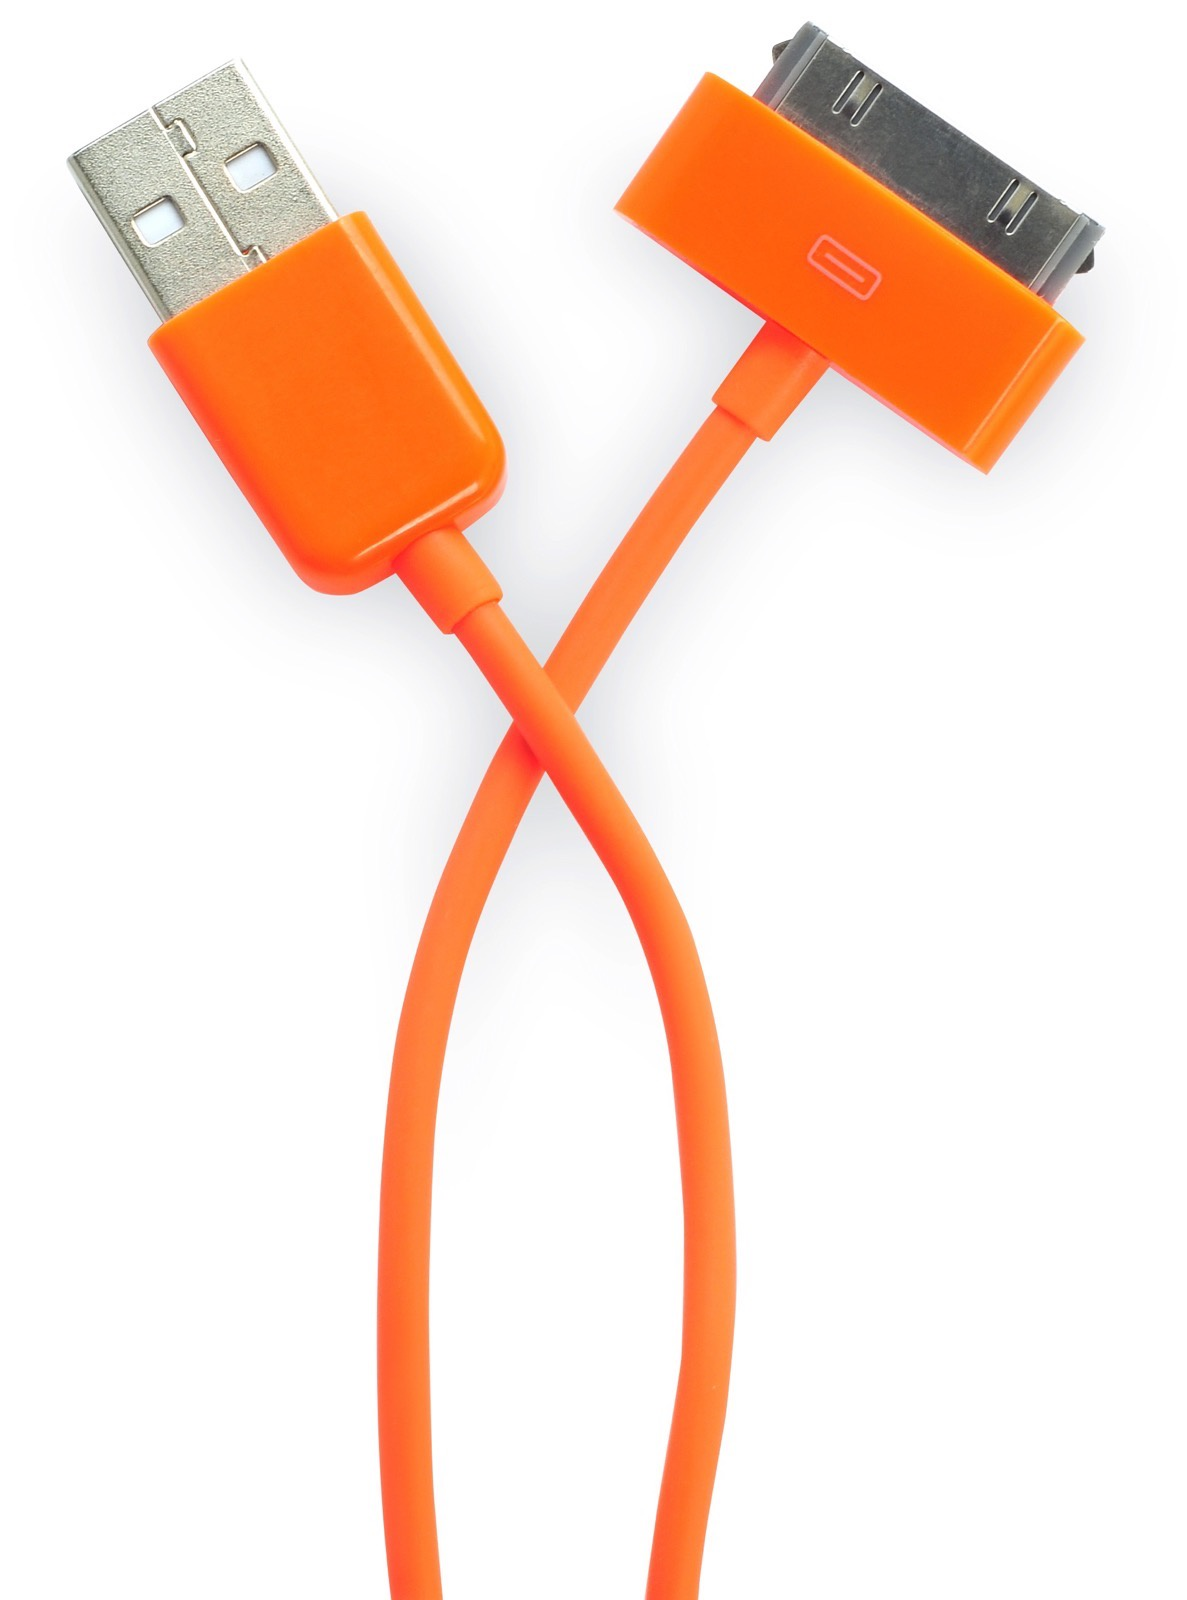 Кабель Gurdini 30- pin 70 см orange для Apple iPhone, iPad, iPod, оранжевый кабель hama 30 pin apple usb 2 0 черный 1м для apple iphone 3g 3gs 4 4s 00093577